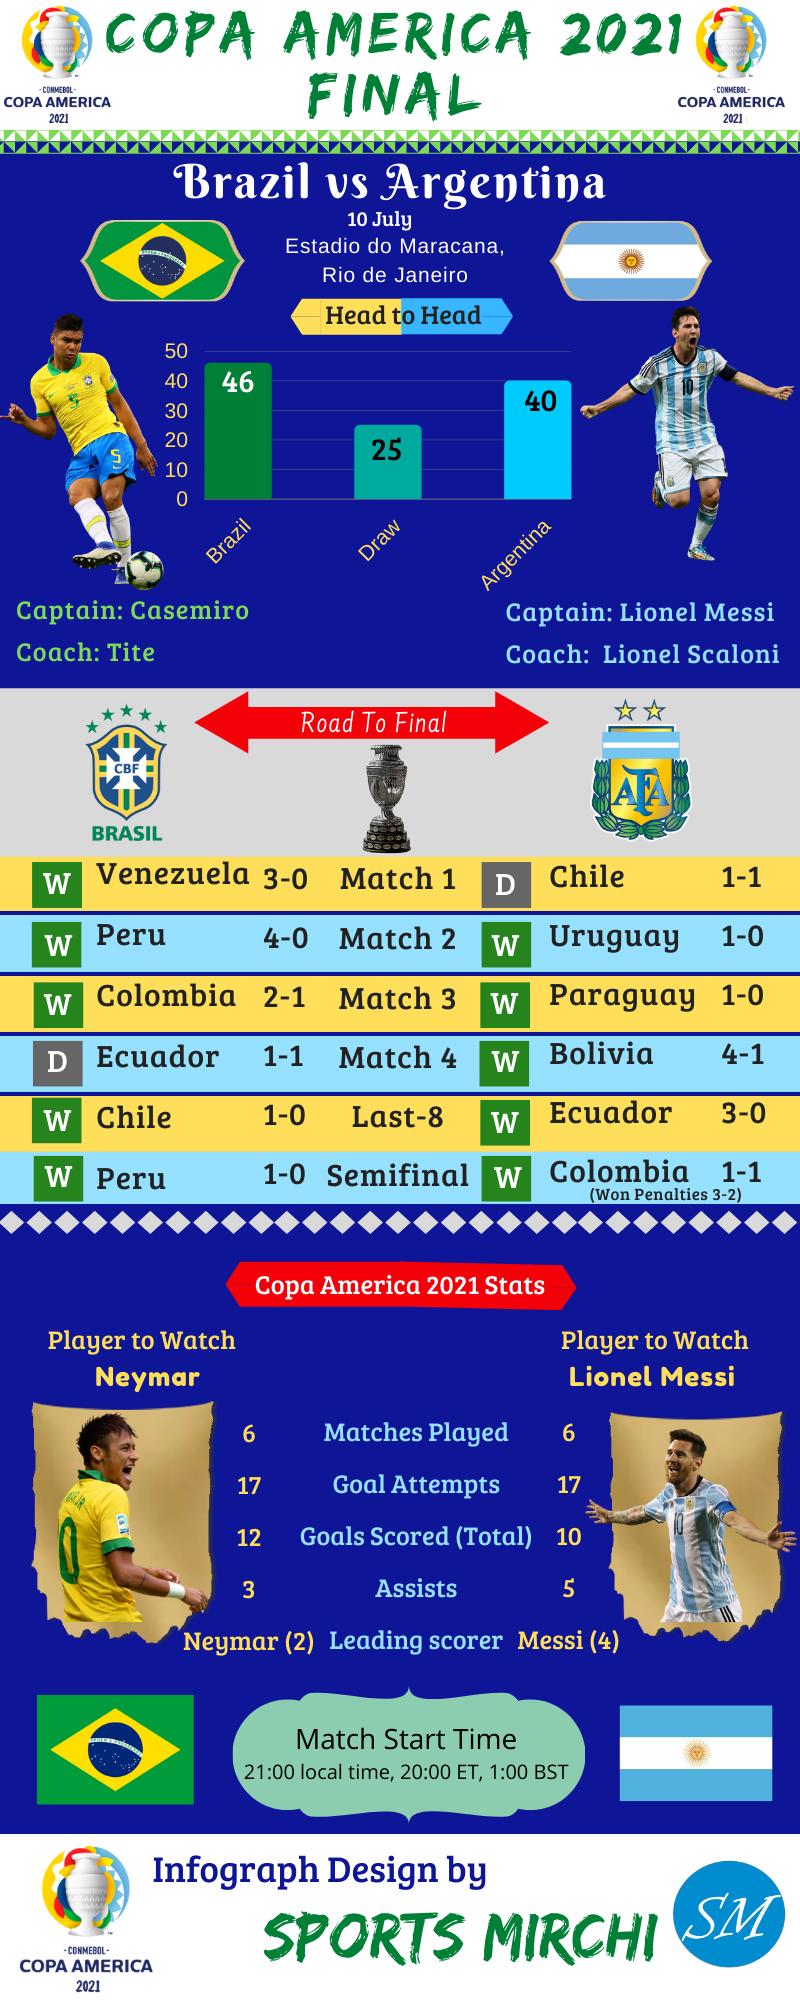 Argentina vs Brazil final of Copa America 2021 infographic